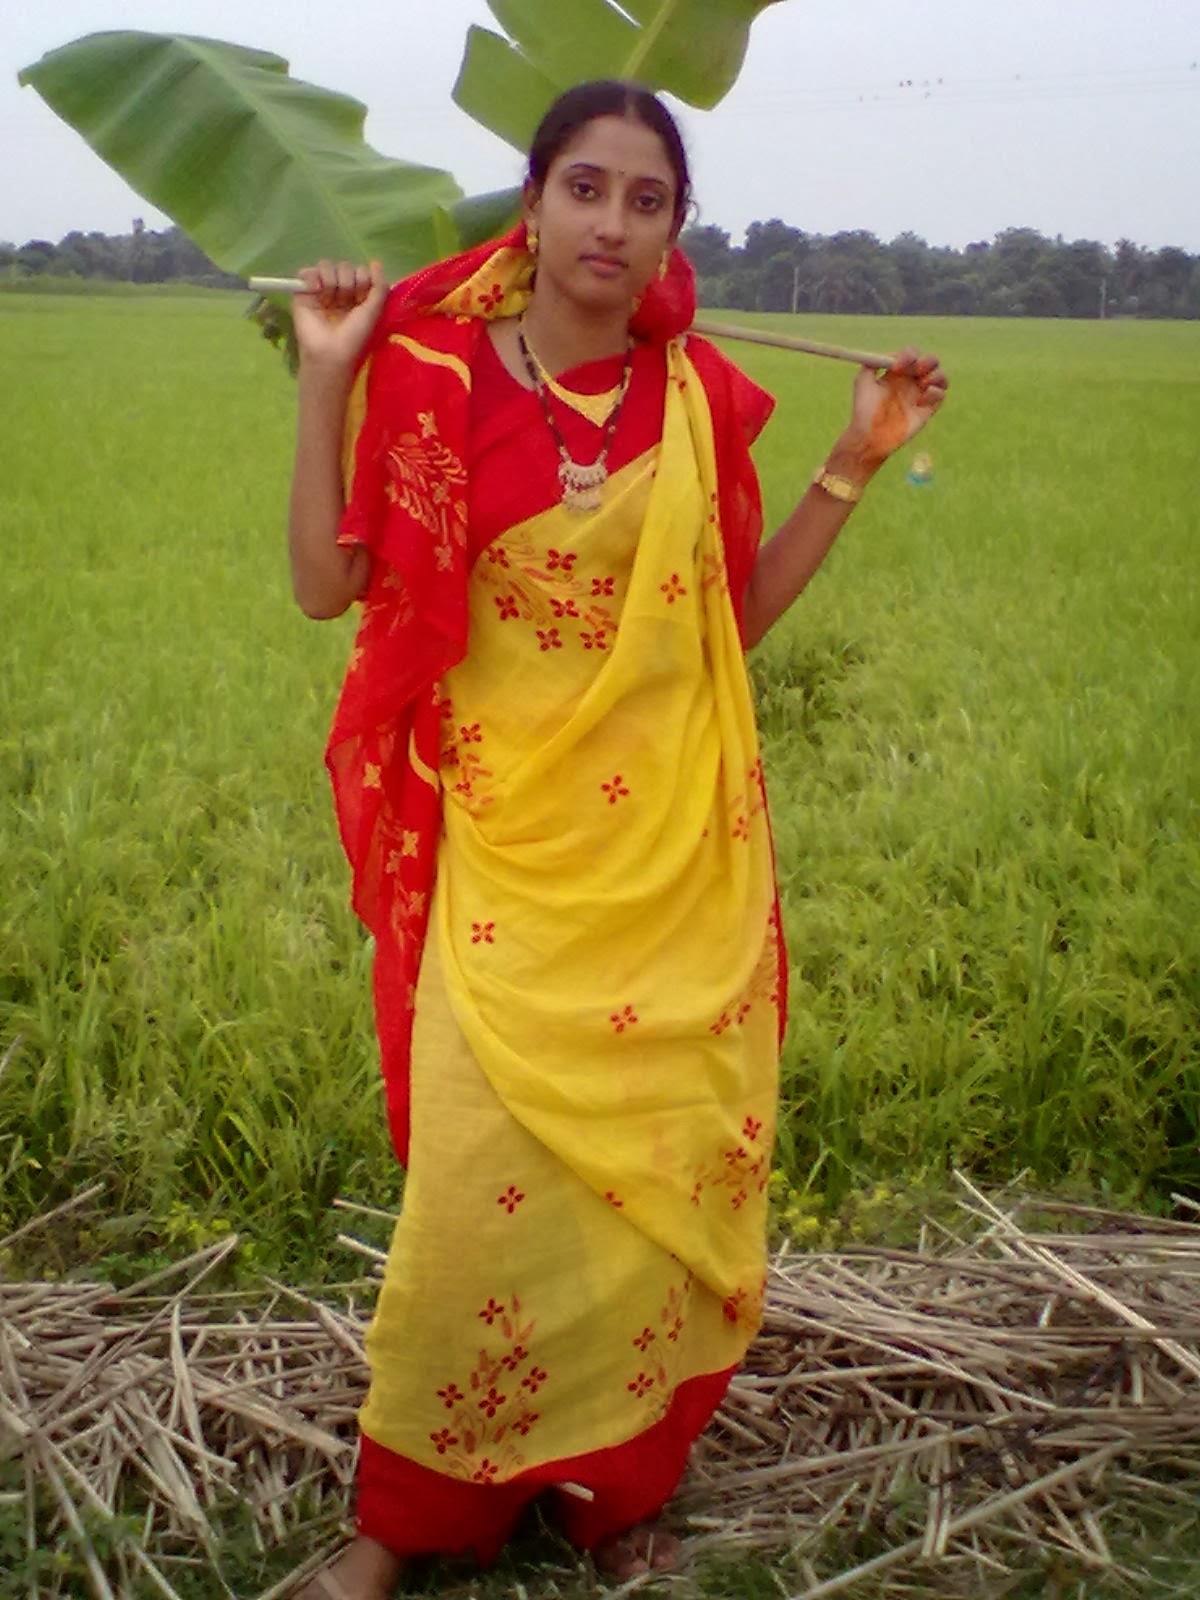 Pure Bangladeshi Village Cute Girls Sexy Unseen Photos 2014